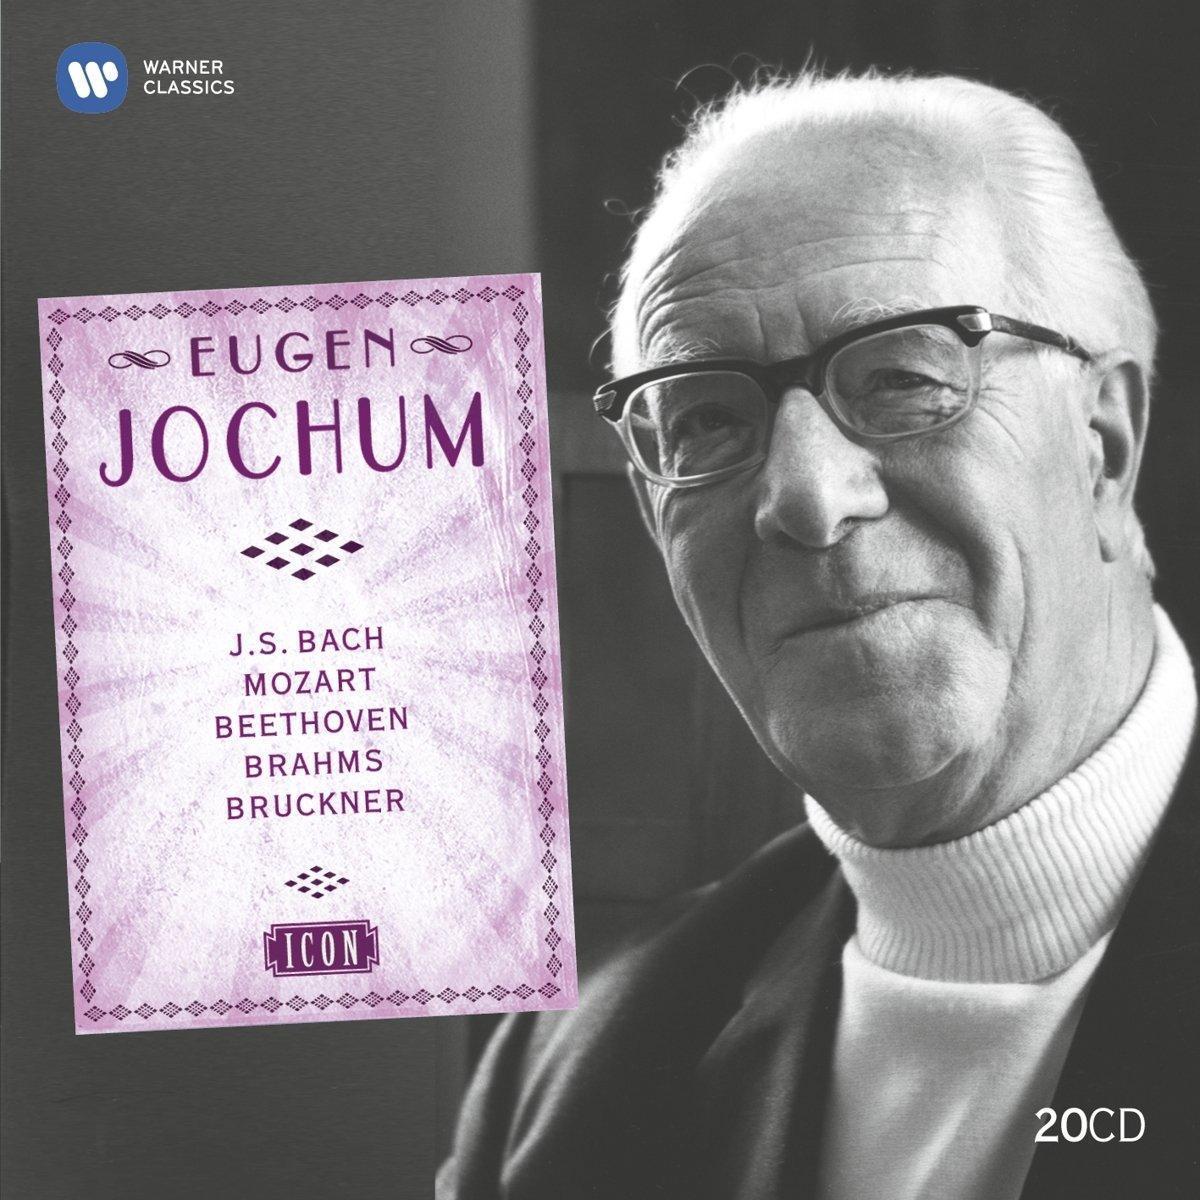 CD : Eugen Jochum - Icon: The Complete Emi Recordings (Boxed Set)